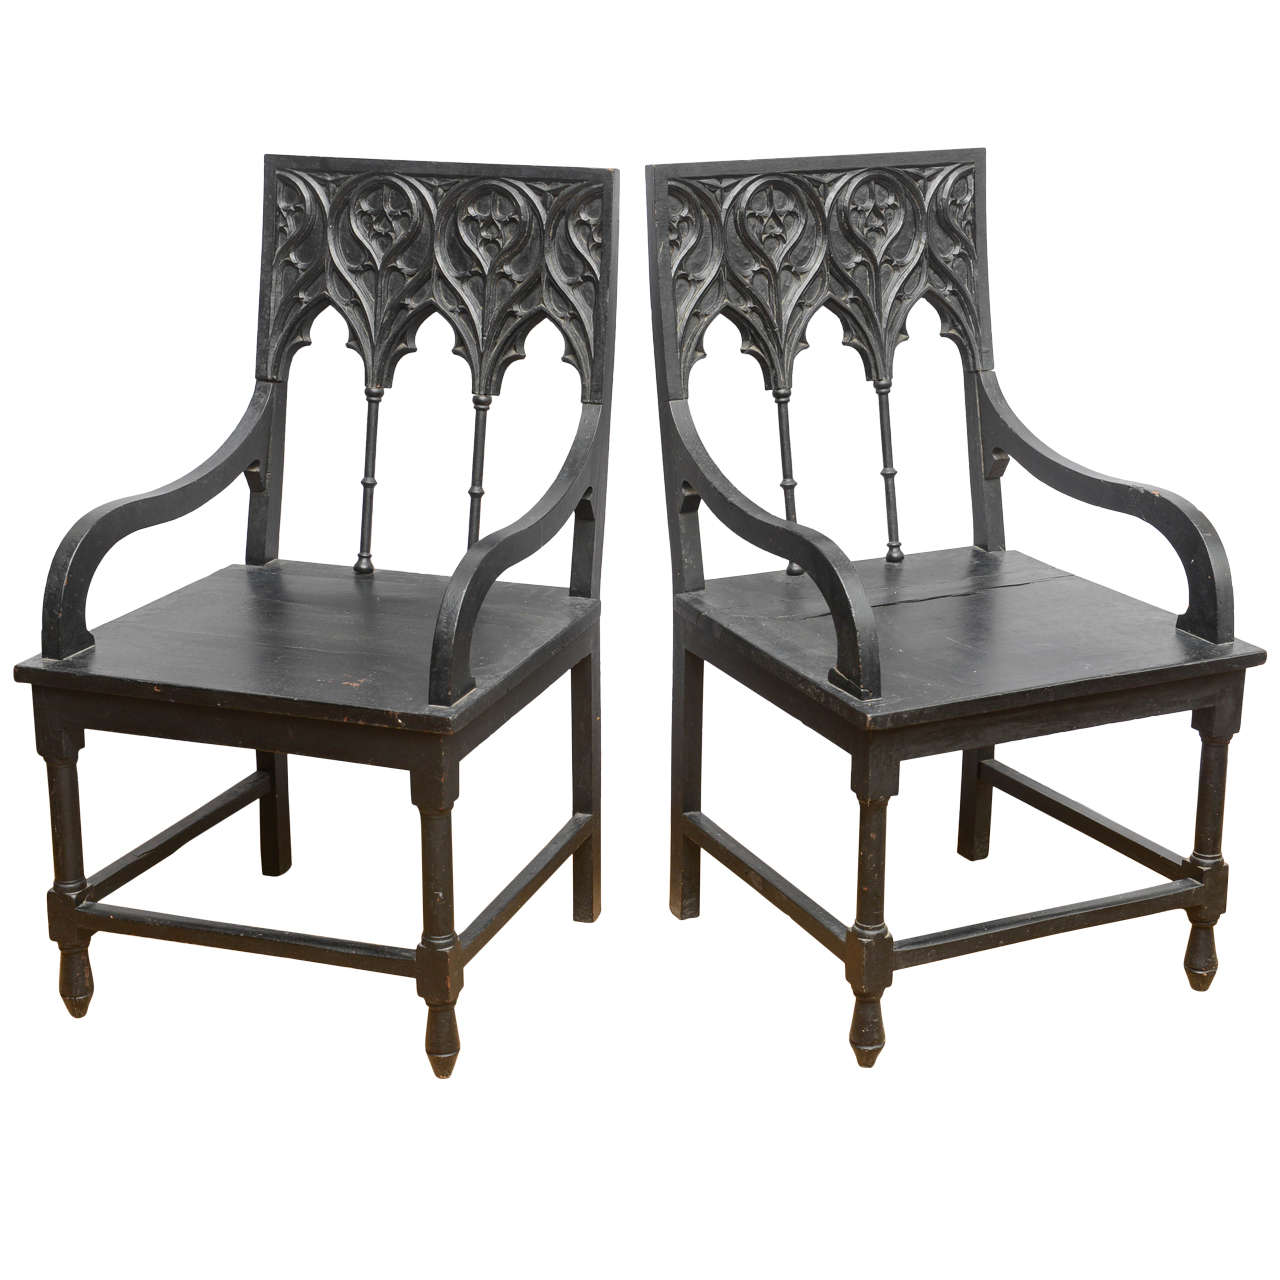 Pouf Design Egg Pouf Jacobsen : Spanish gothic armchairs at stdibs